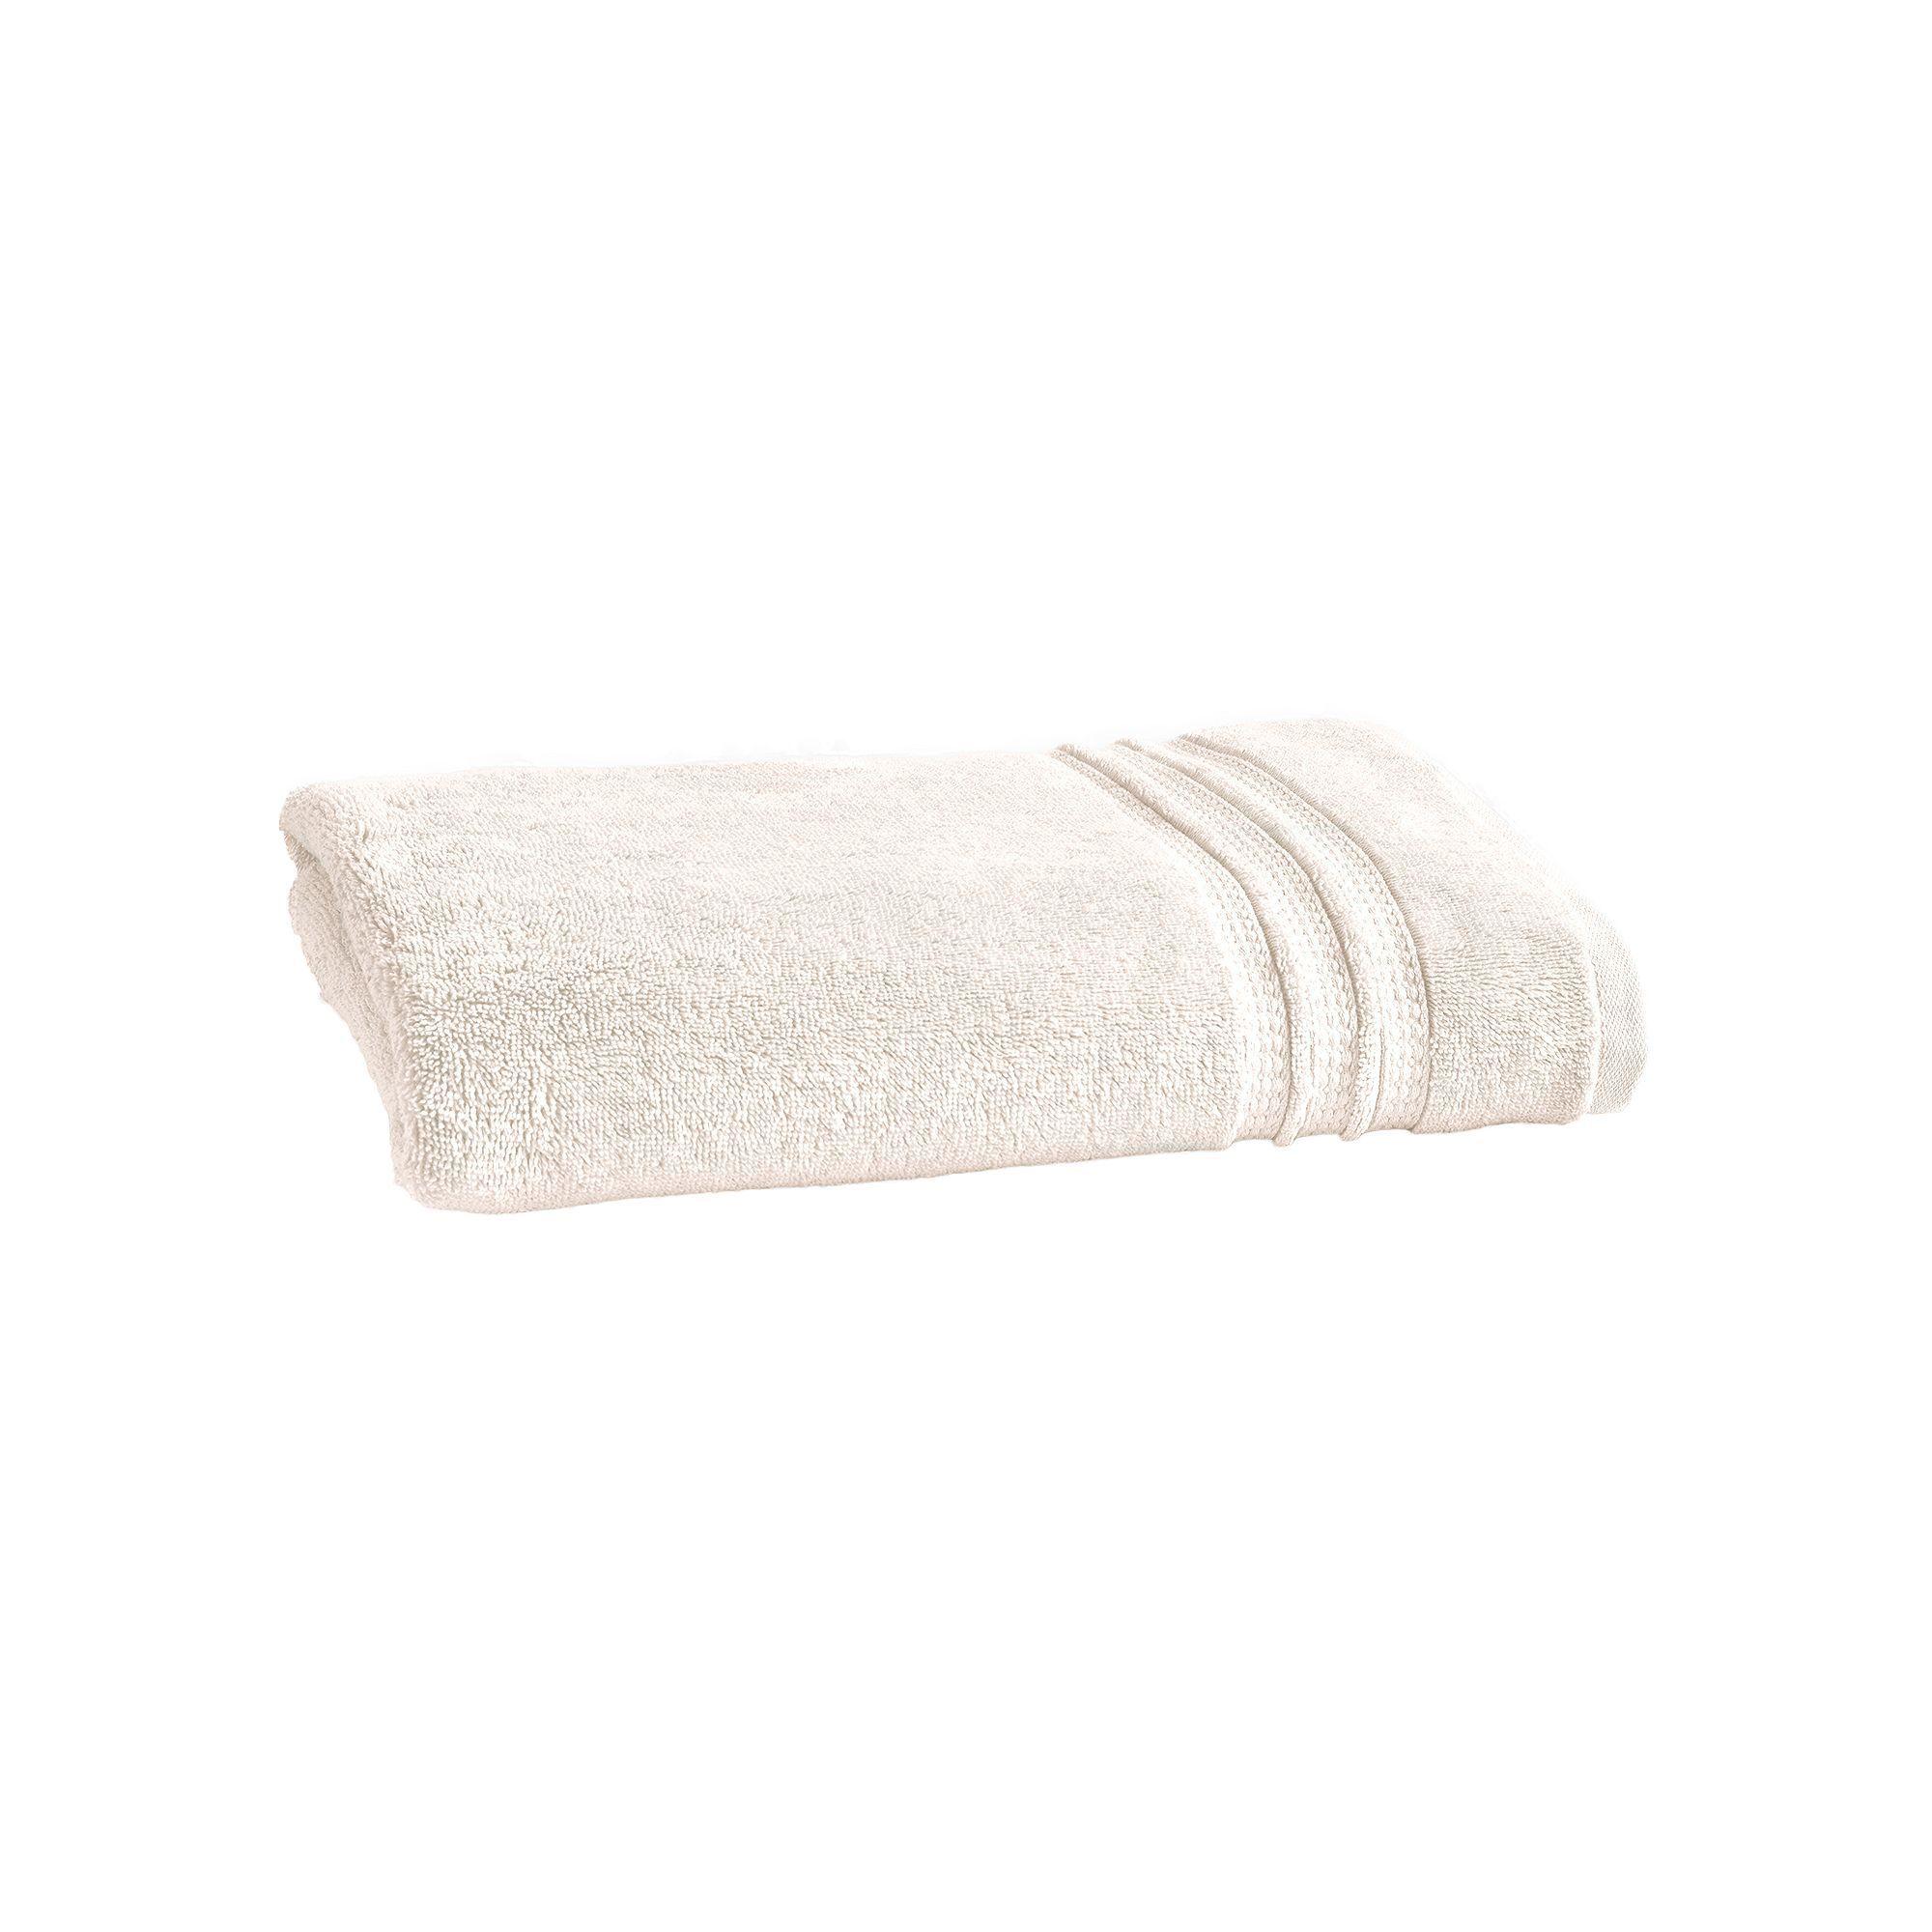 Loft By Loftex Loft Essentials Solid Bath Towel Bath Towels